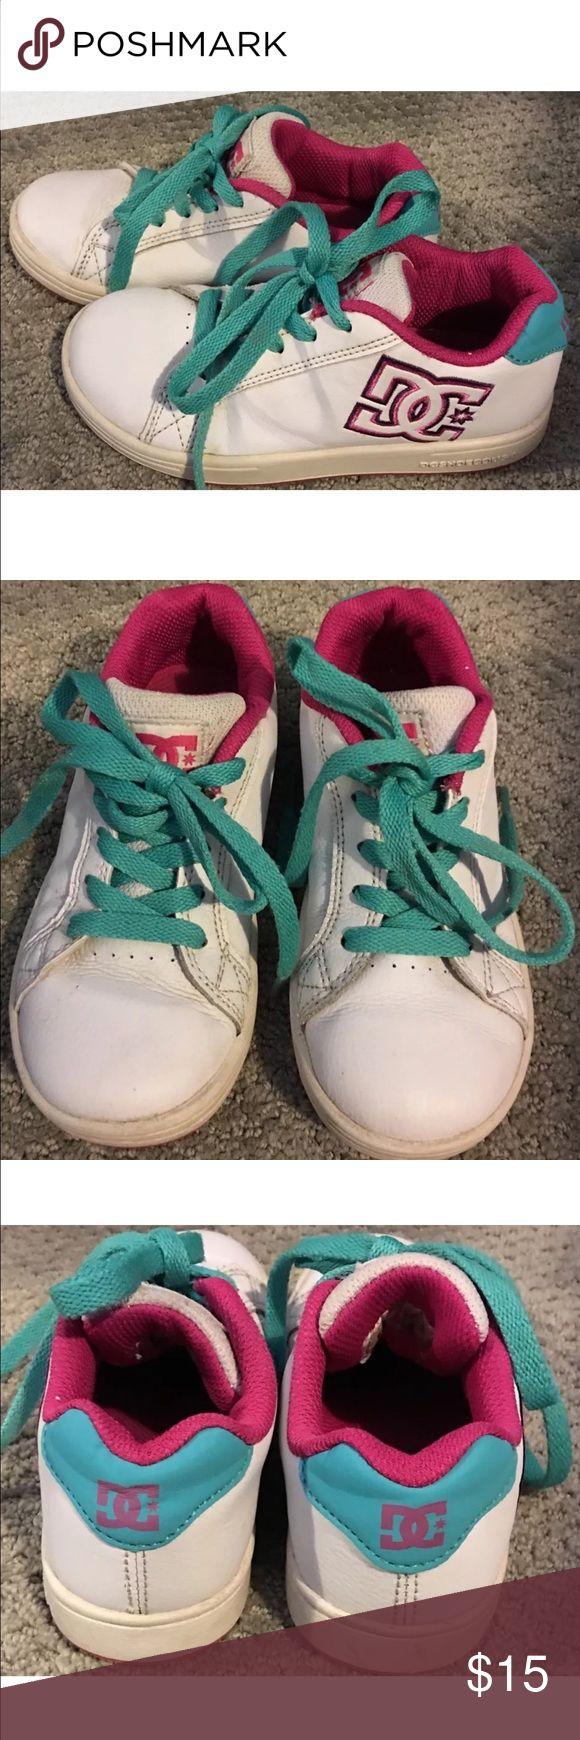 Selling this DC SKATE SHOES, SZ YOUTH 13, LEATHER w/DC LOGO on Poshmark! My username is: christinarabram. #shopmycloset #poshmark #fashion #shopping #style #forsale #DC Skate  #Other